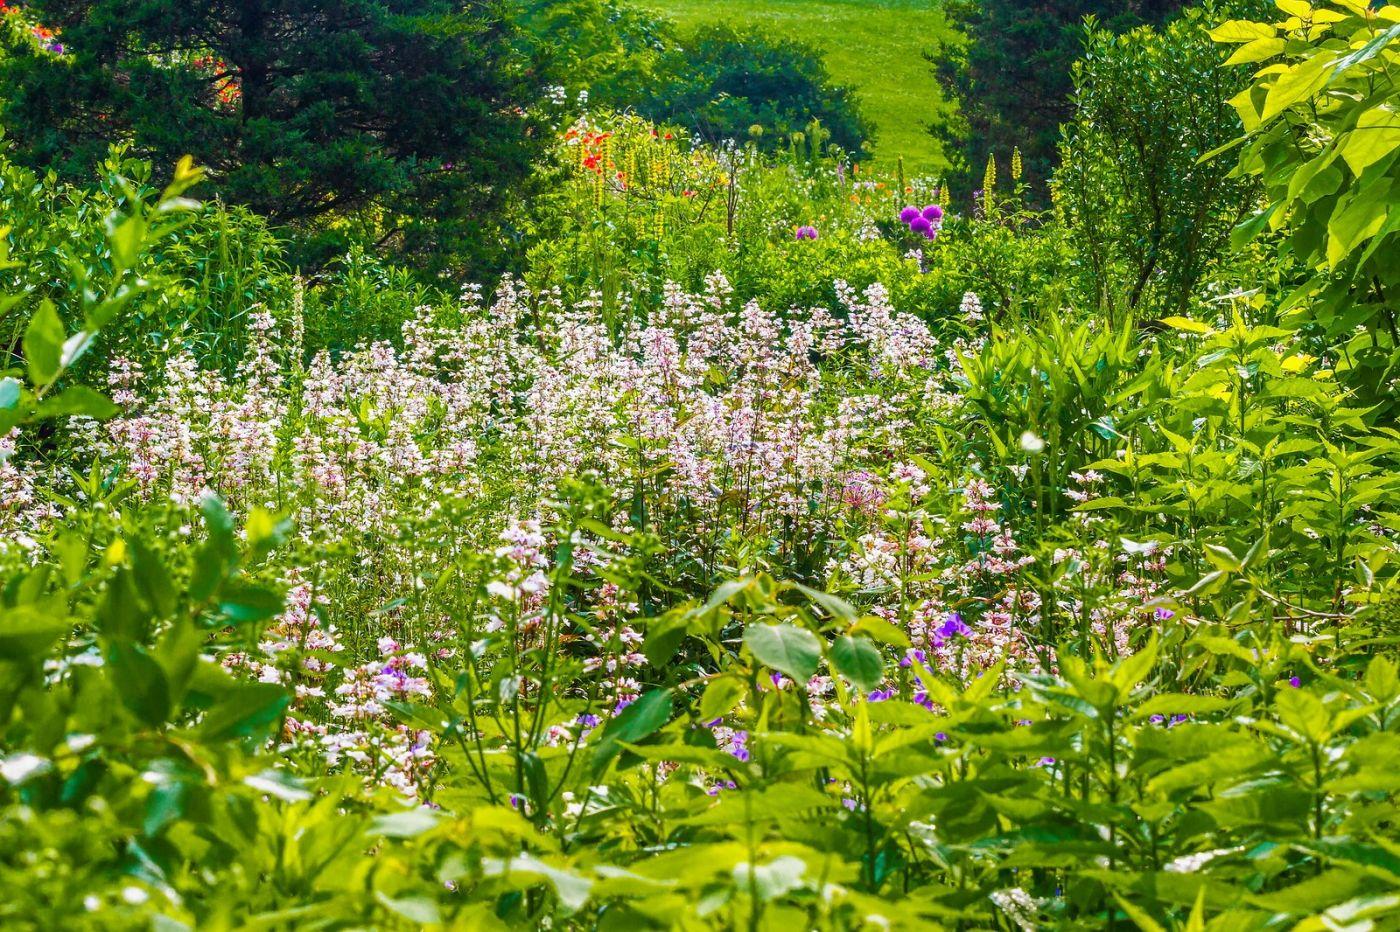 Chanticleer花园,有梦想的季节_图1-17